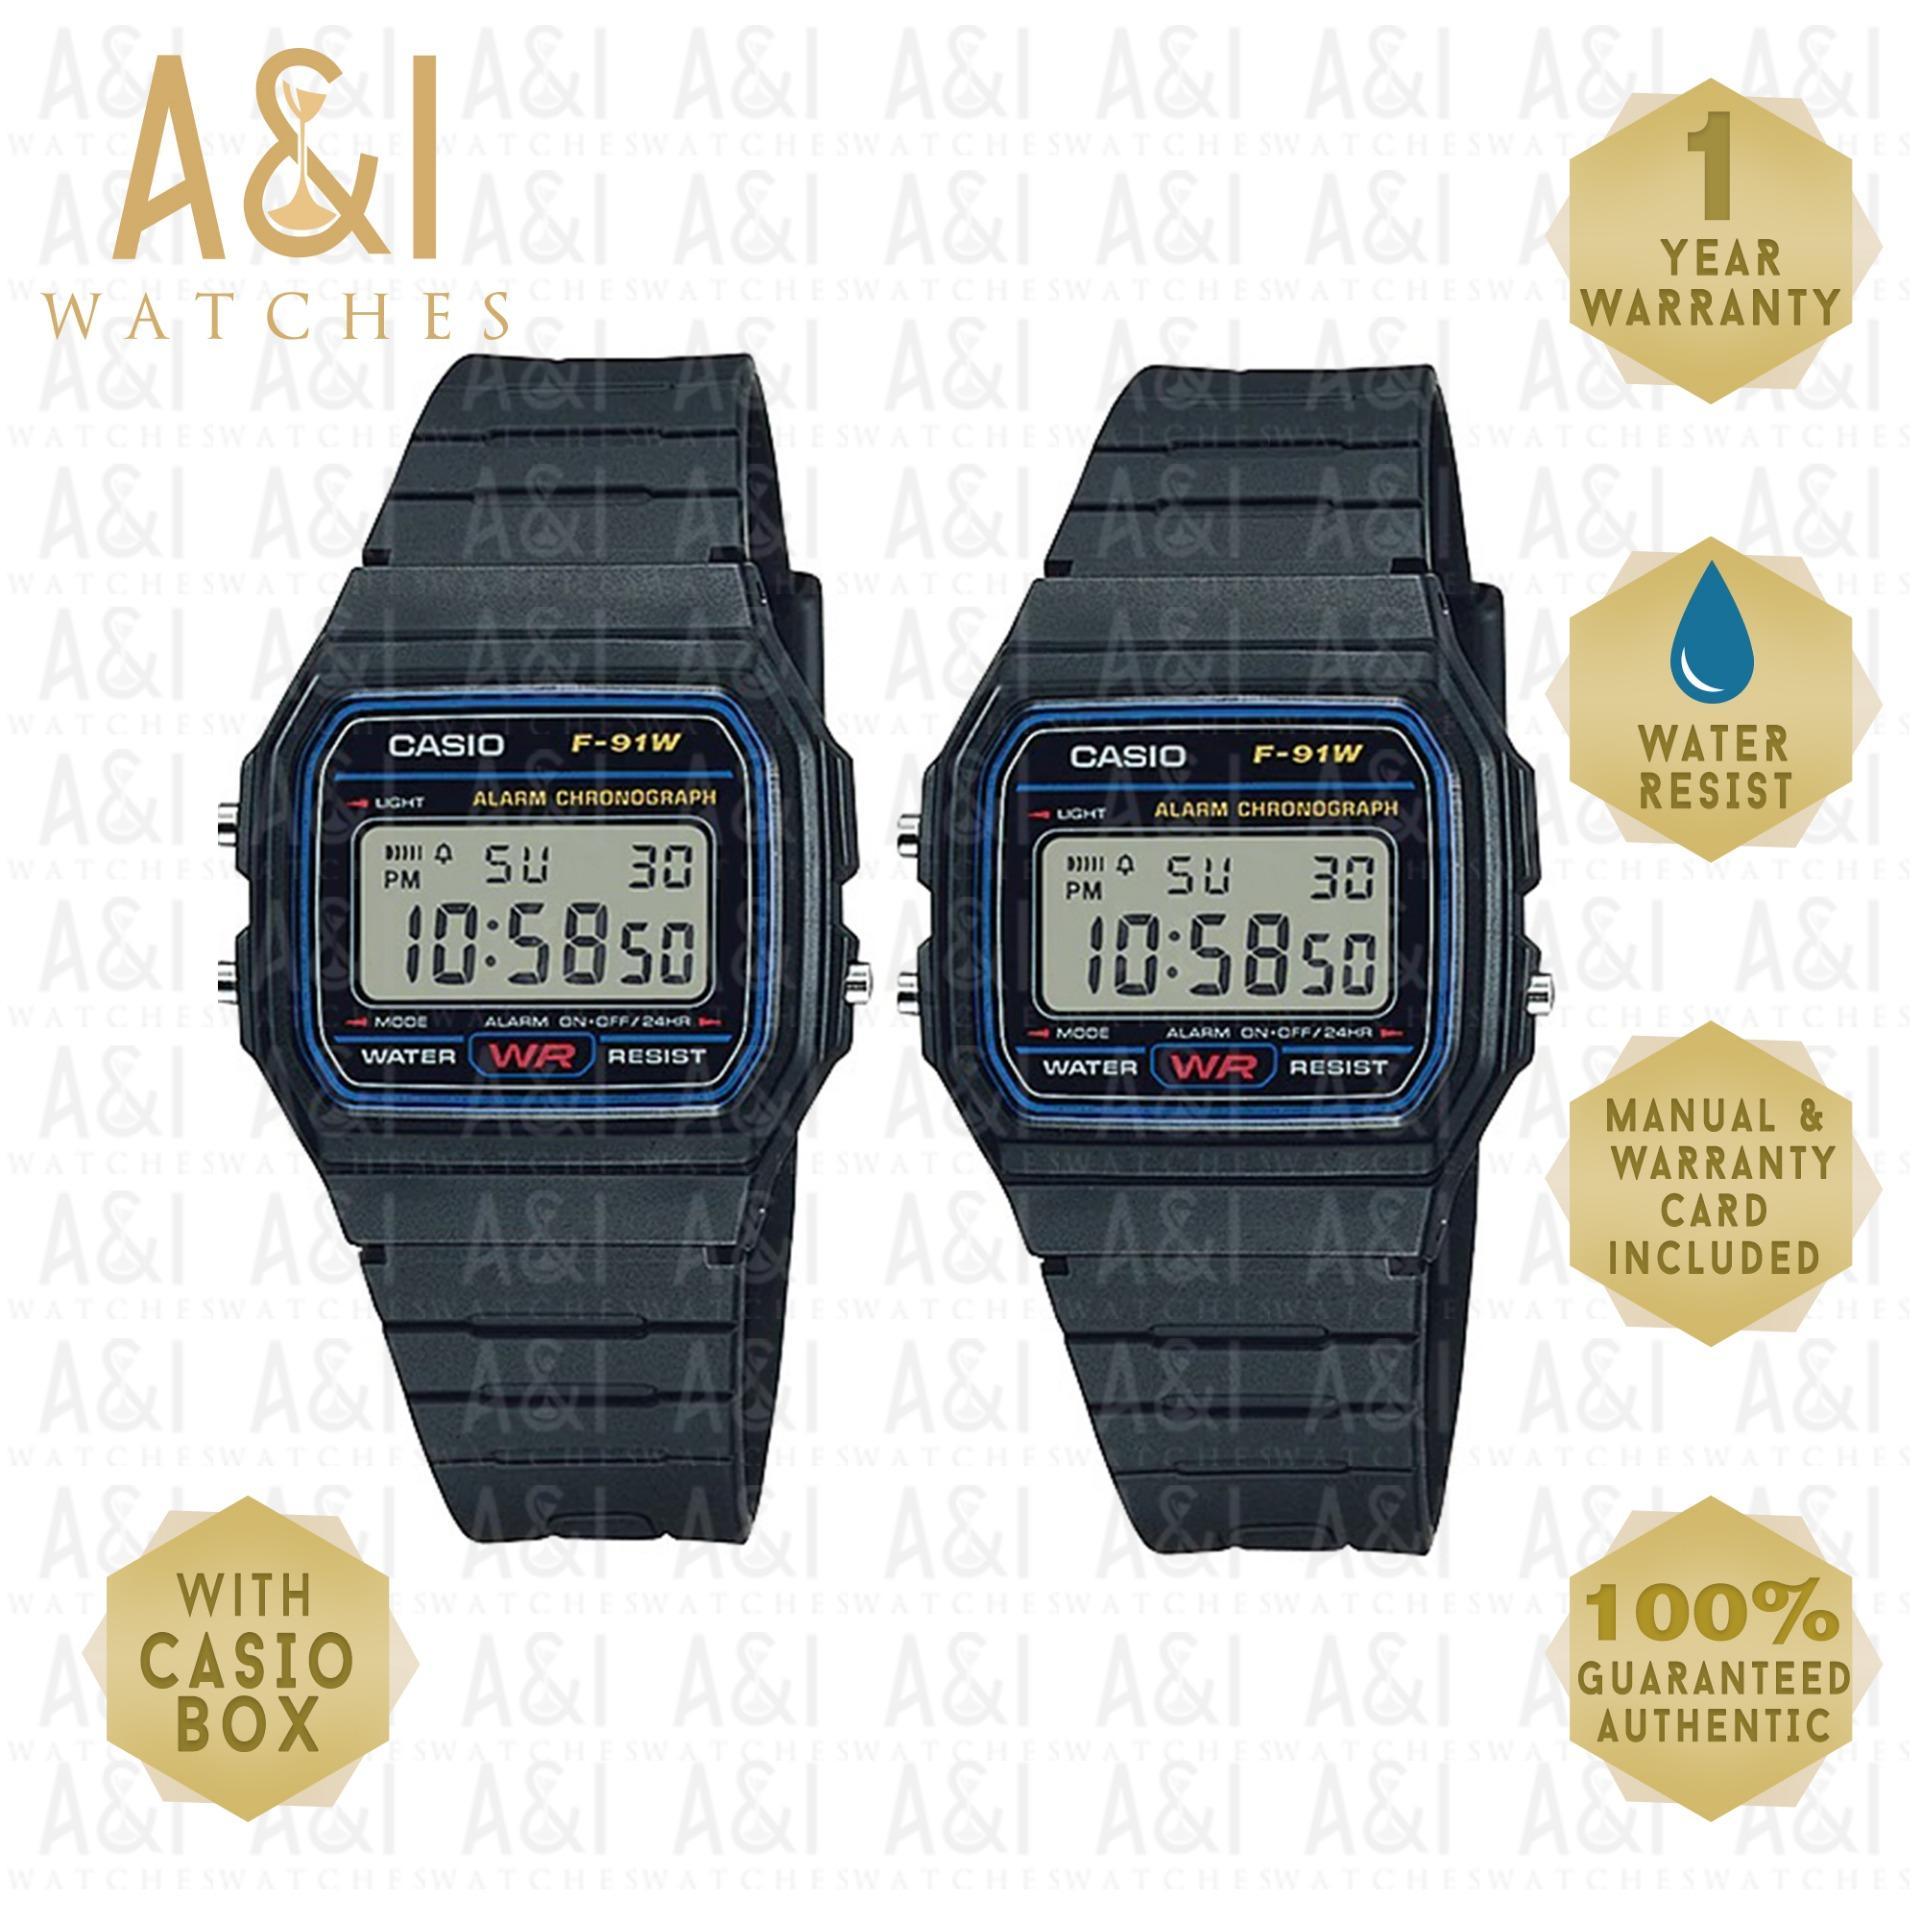 Casio Philippines Watches For Sale Prices Reviews Lazada Jam Tangan Wanita Aw 48he 1avdf Original Couple Classic F 91w 1dg 1yr Warranty